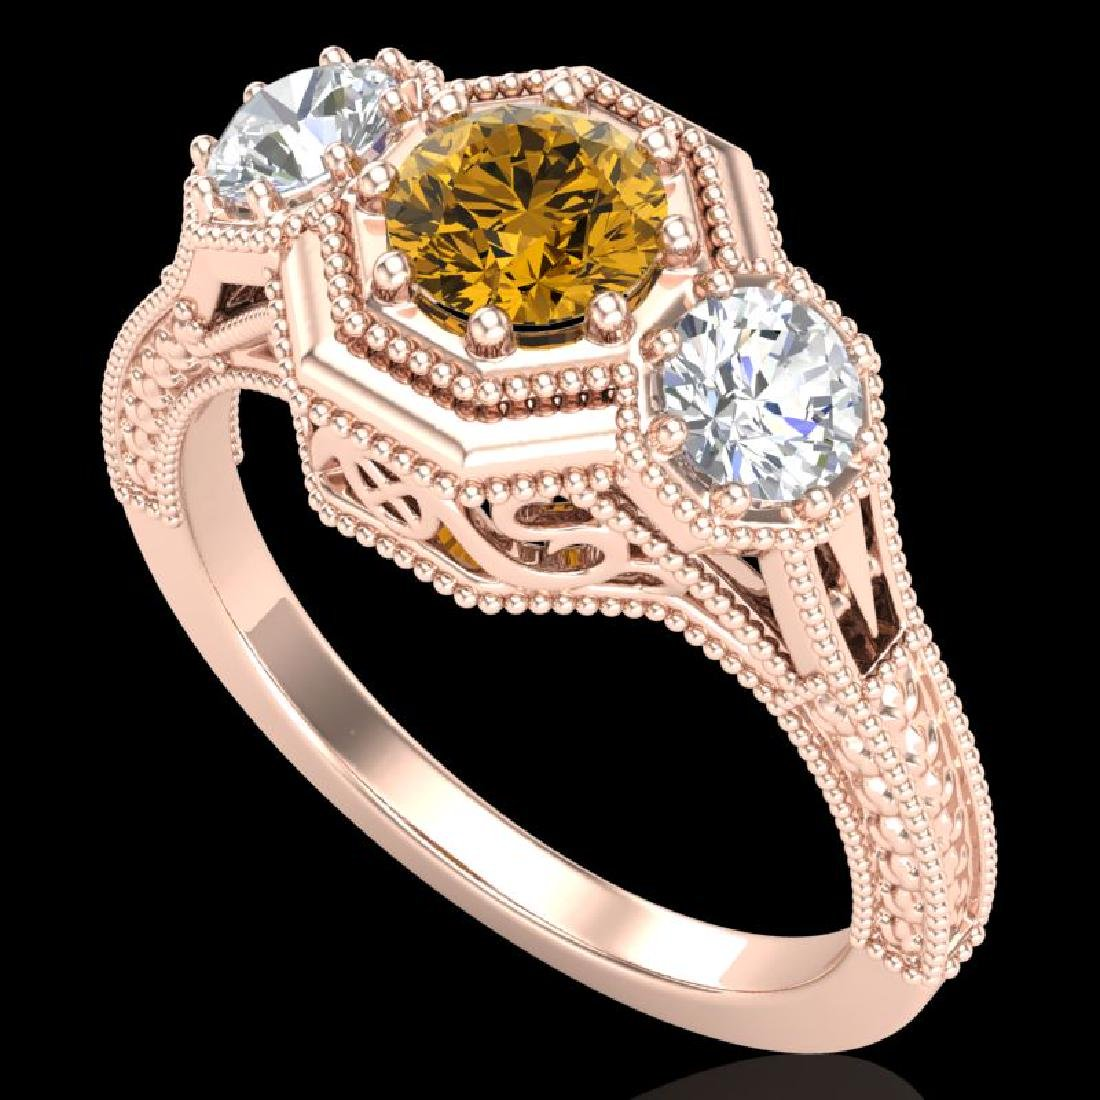 1.05 CTW Intense Fancy Yellow Diamond Art Deco 3 Stone